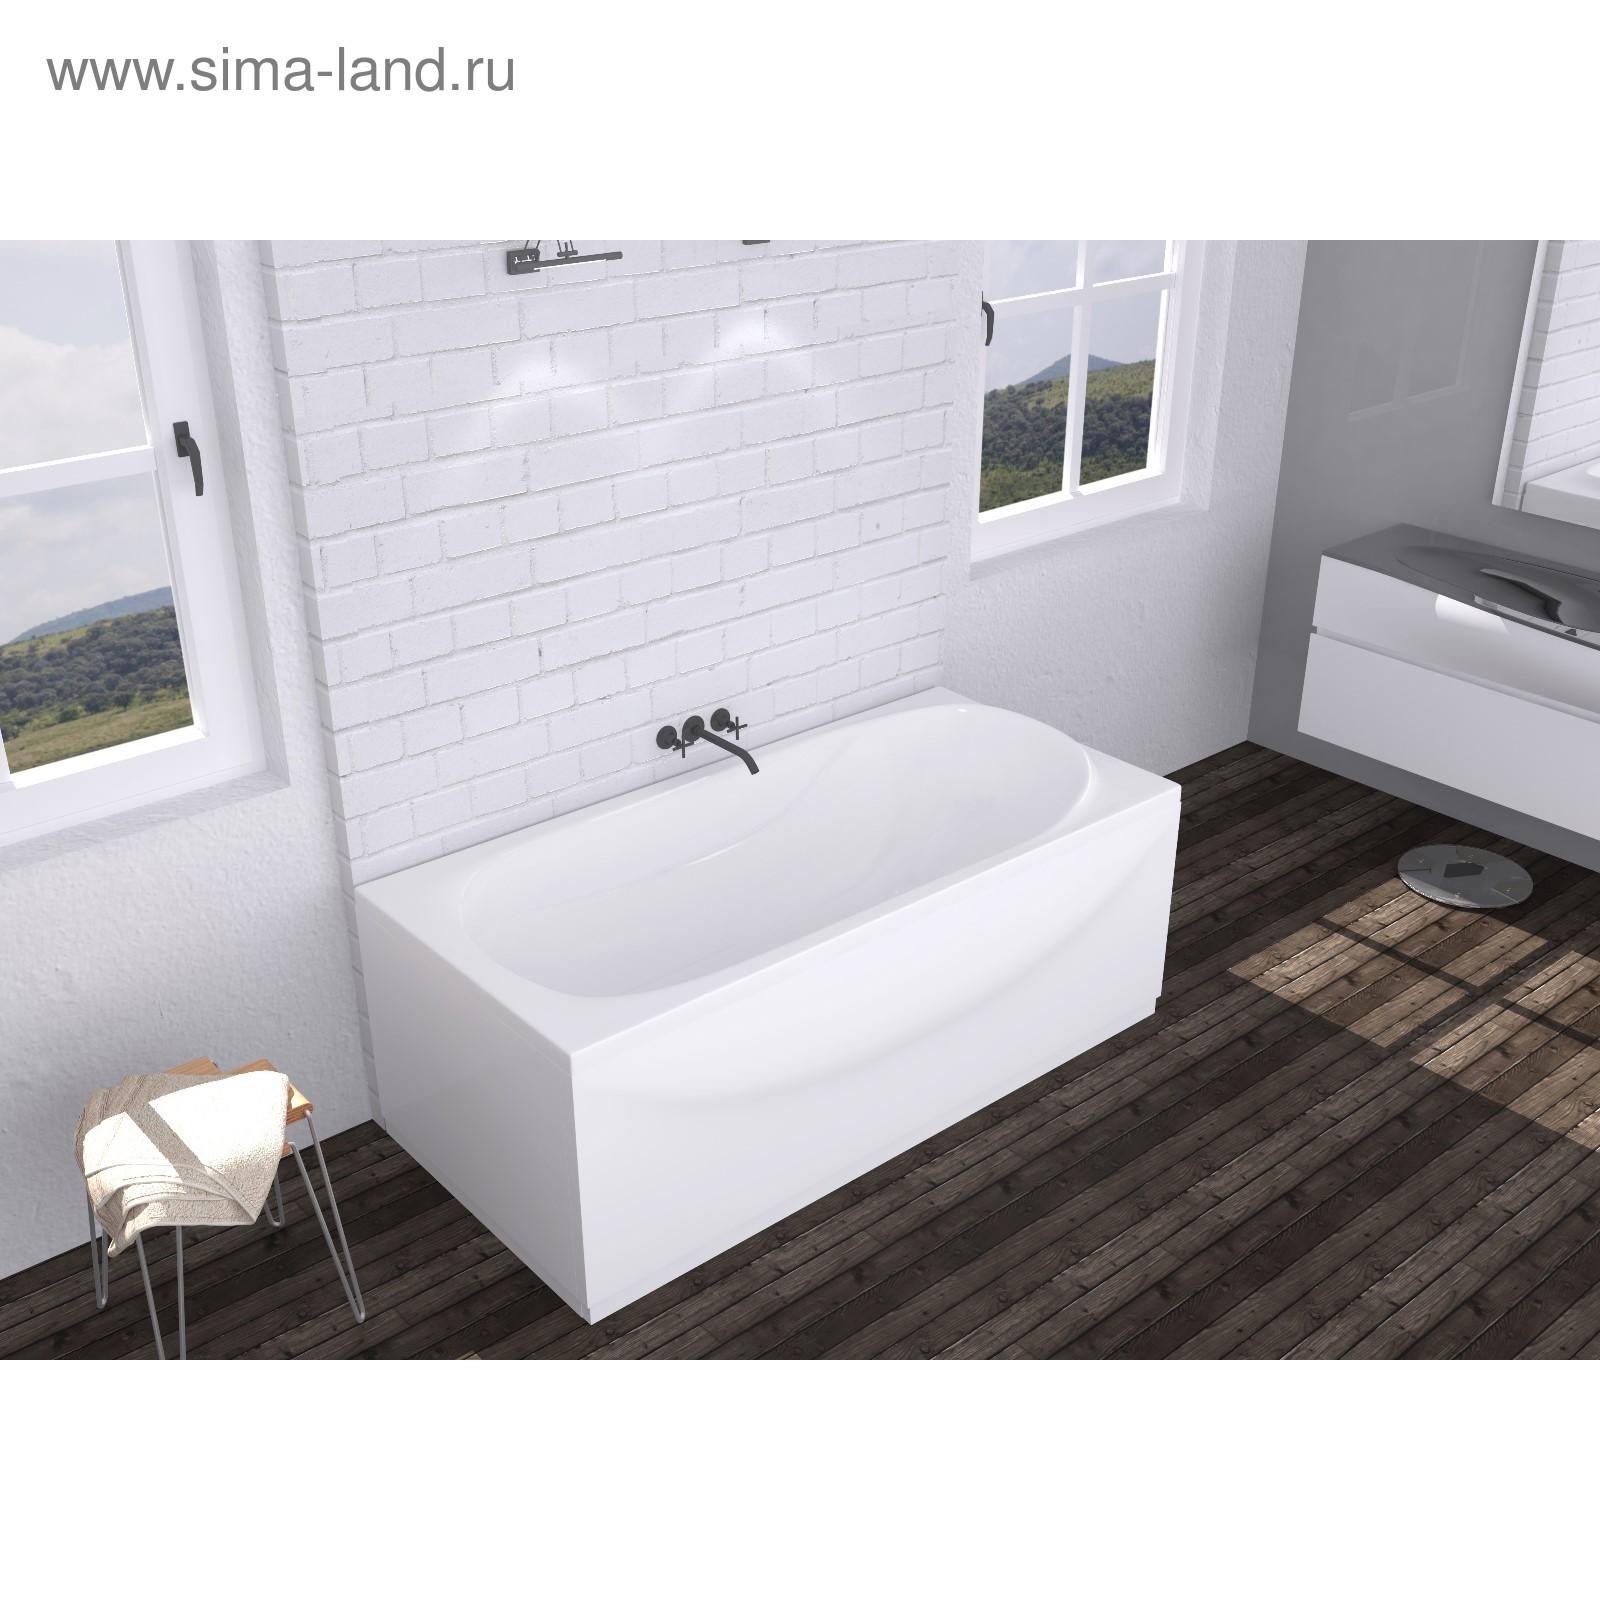 8c5bb9ae4850 Ванна акриловая DOMANI-Spa Classic, 150 × 70 × 59 см, без каркаса и ...